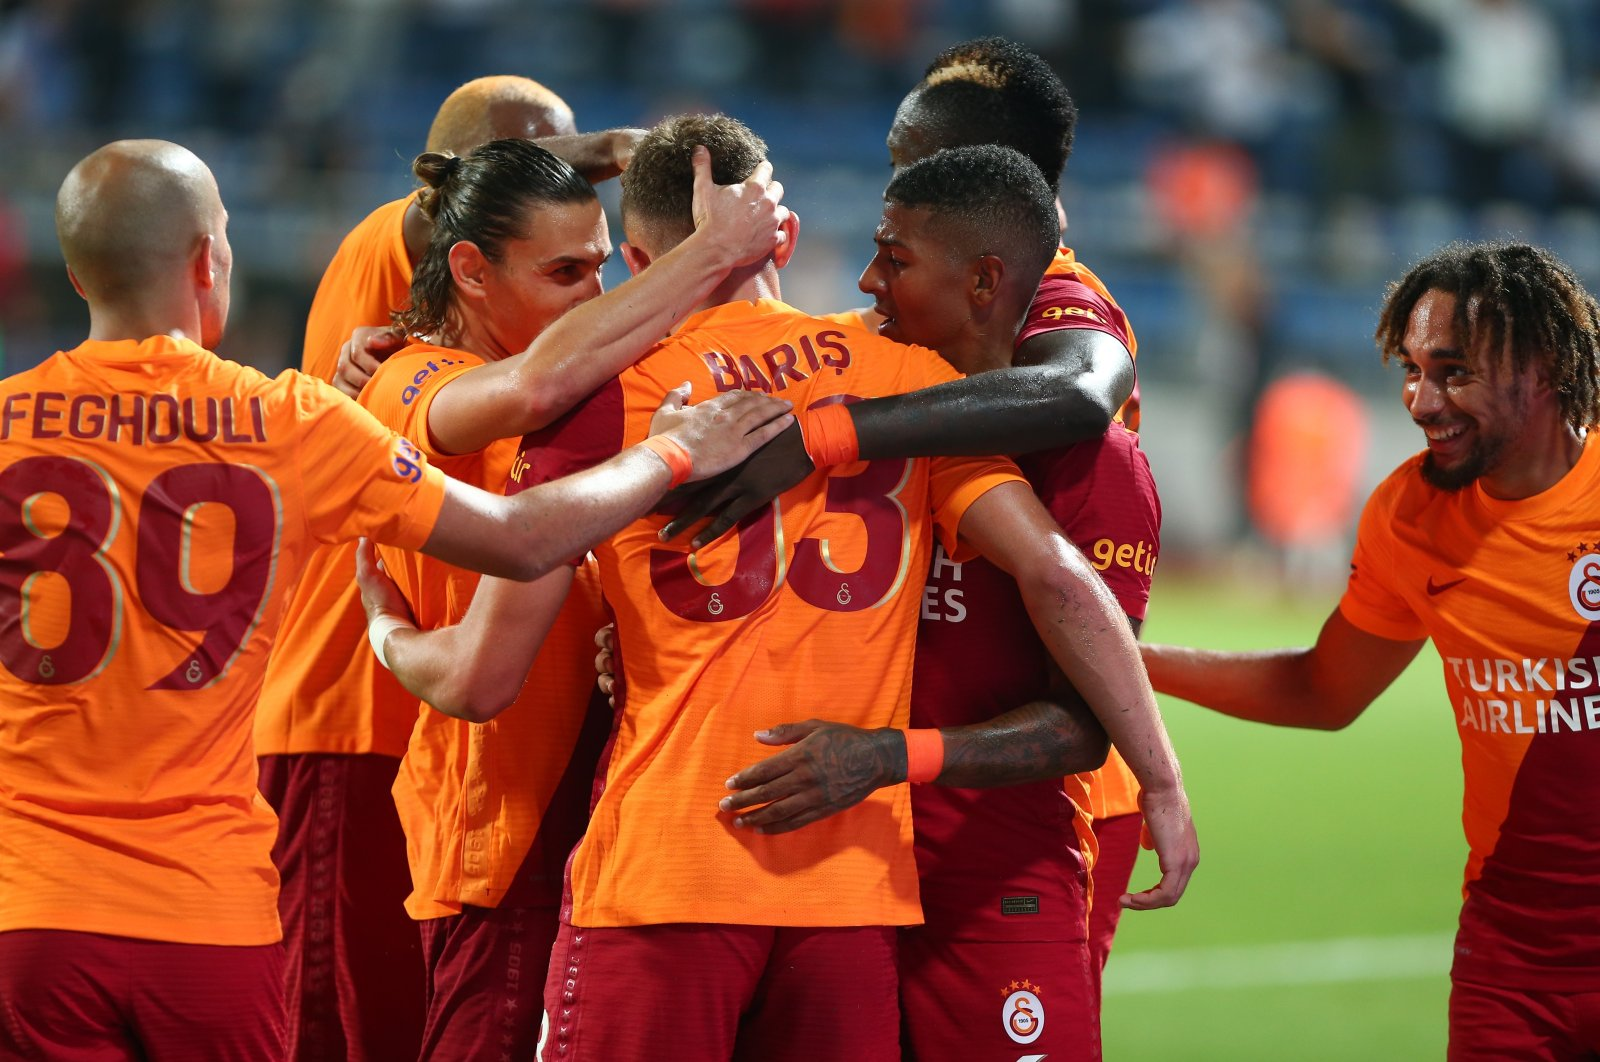 Galatasaray team celebrates a goal during the Europa League playoff football match against Randers in Istanbul, Turkey, Aug. 26, 2021. (IHA Photo)